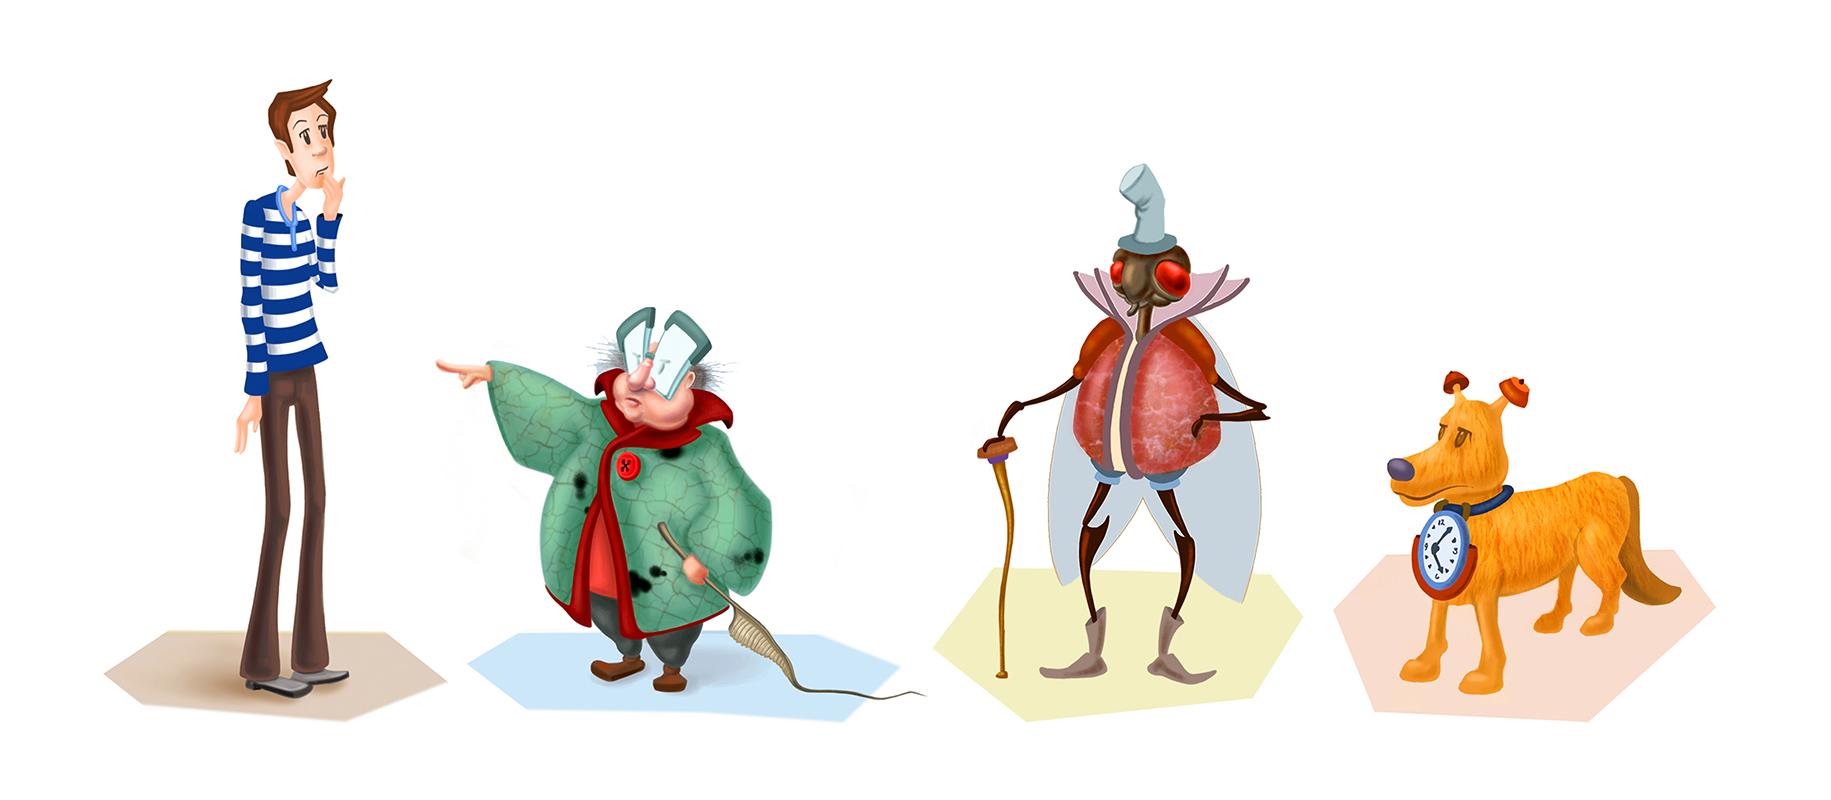 digital character designs